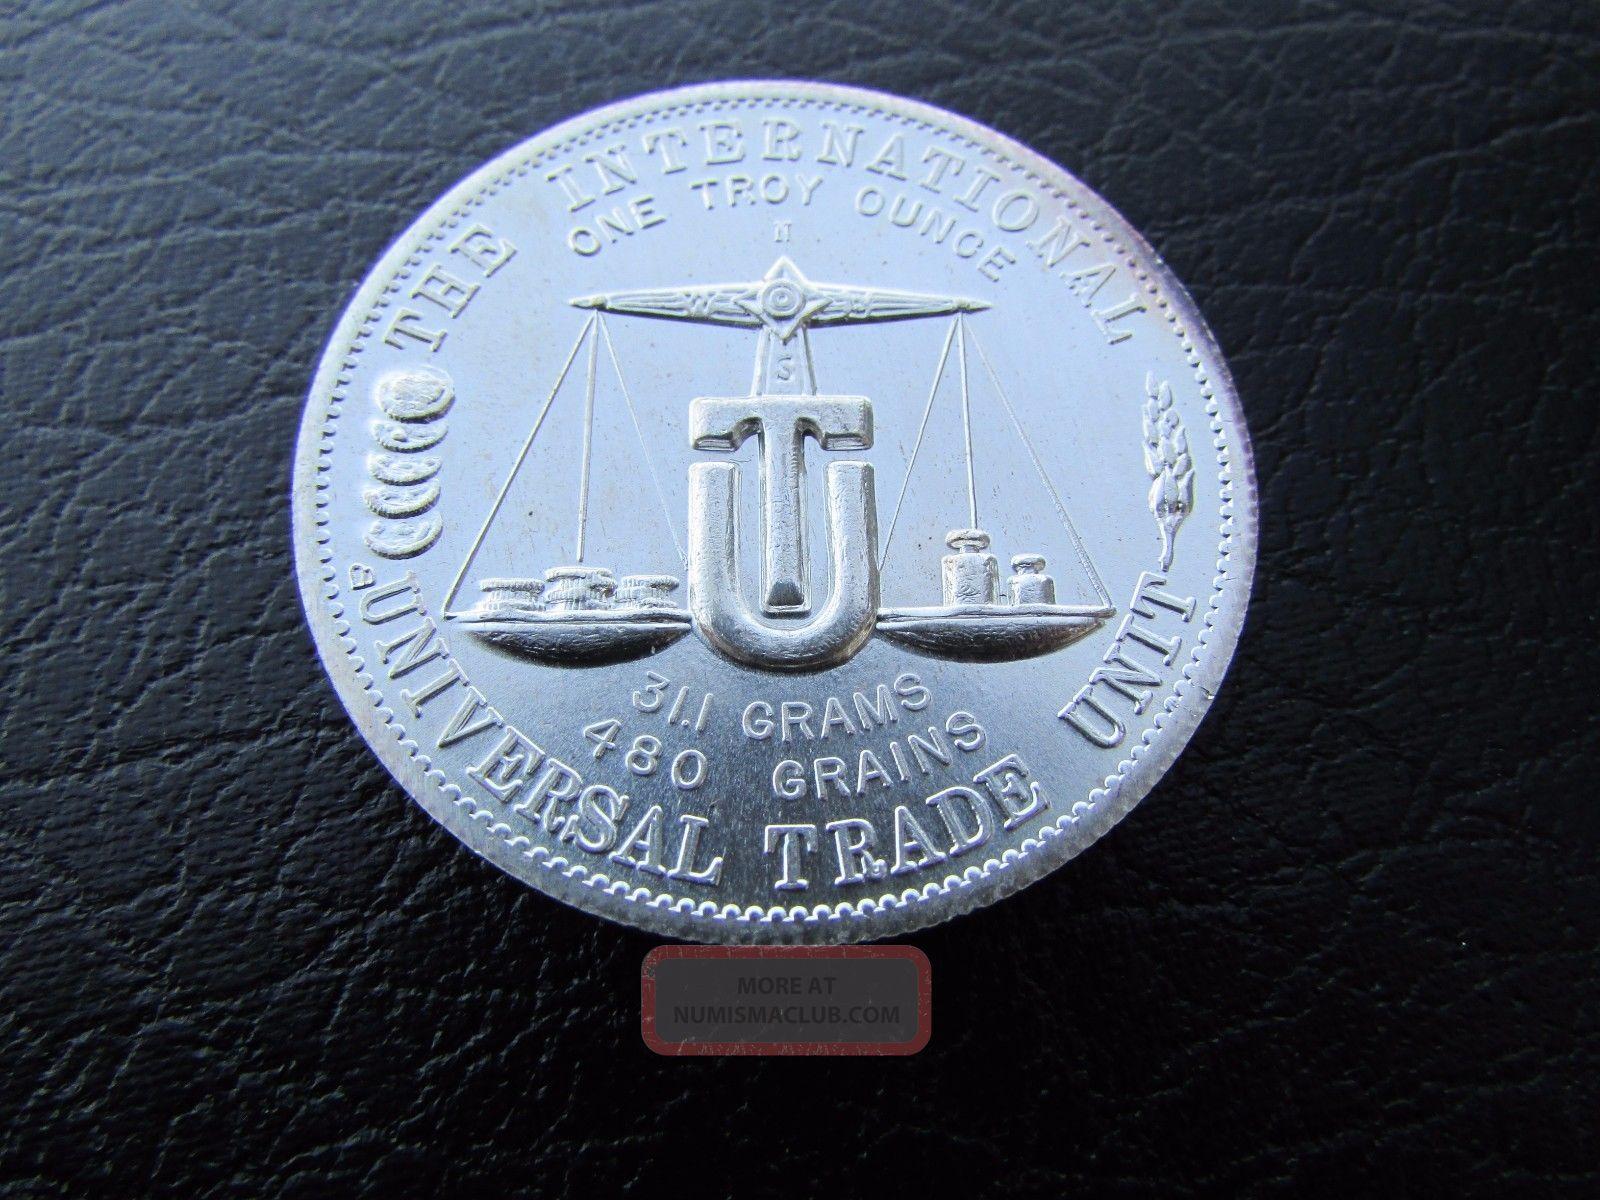 Vintage 1974 1 Oz Silver International Universal World